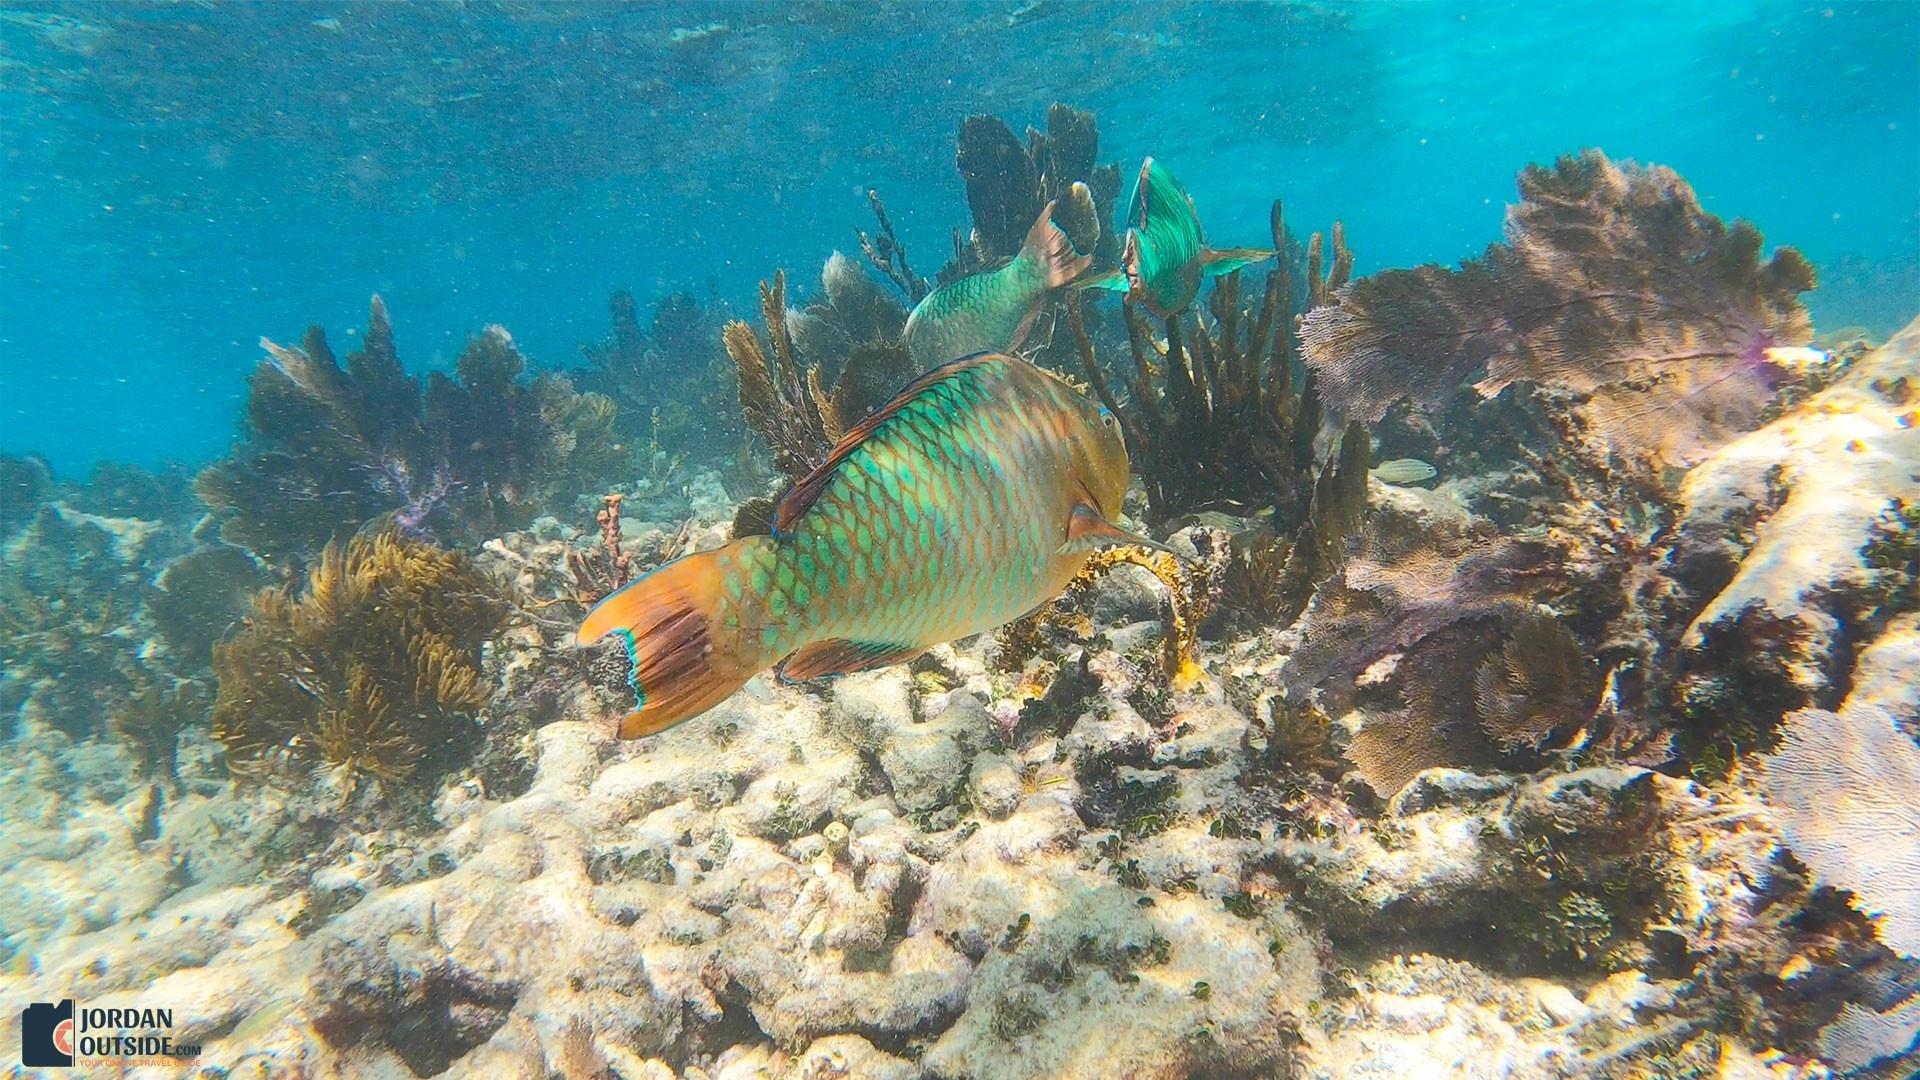 Parrot Fish at the Grecian Rocks Coral Reef